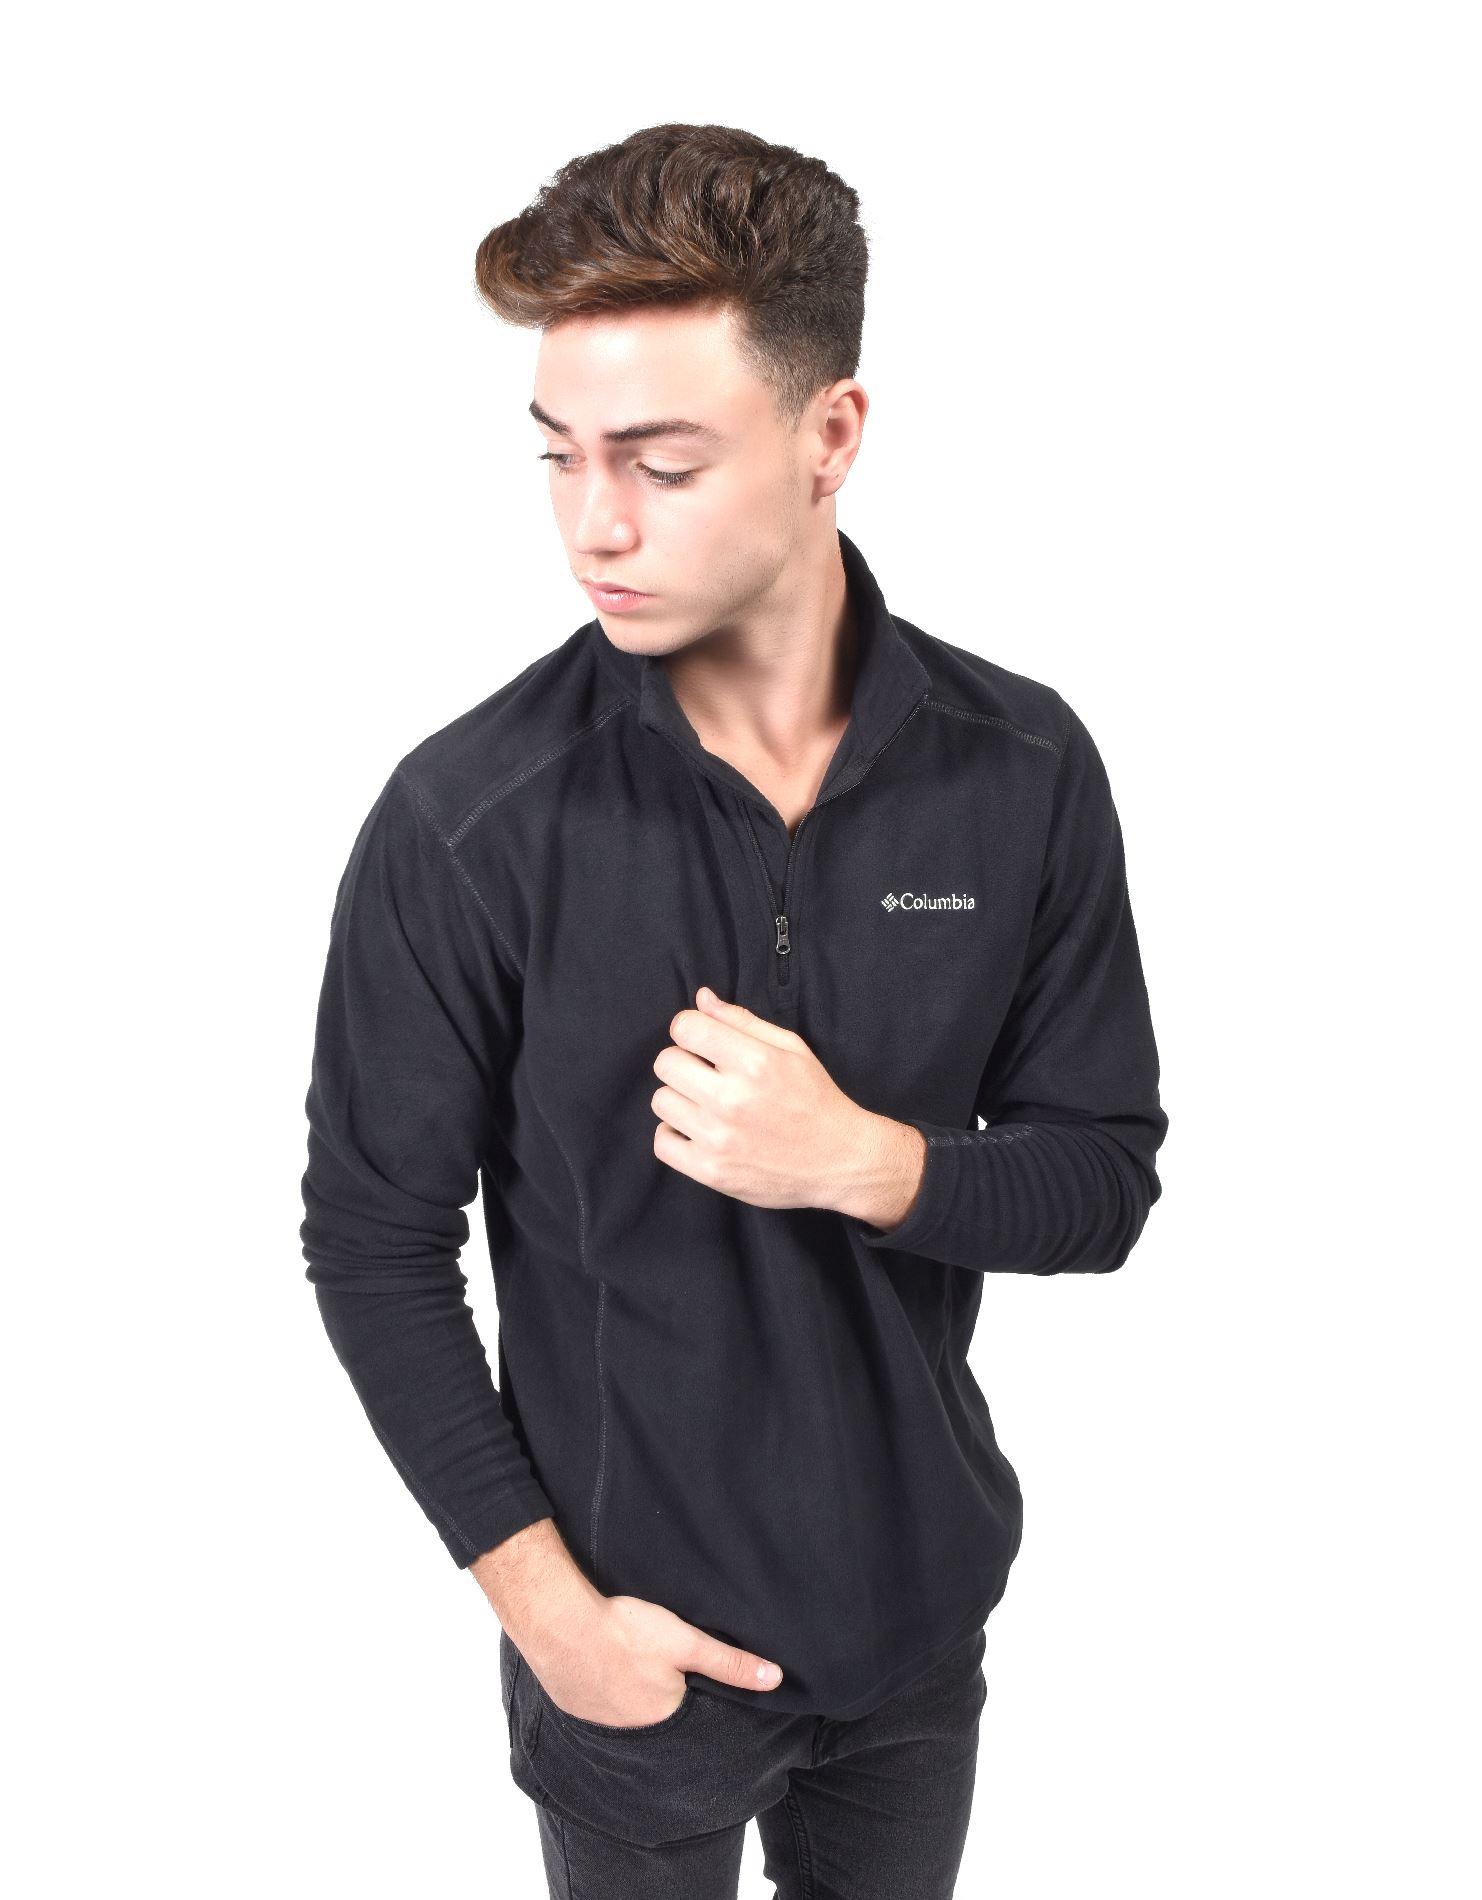 klamath men Shop klamath men's clothing from cafepress find great designs on t-shirts, hoodies, pajamas, sweatshirts, boxer shorts and more free returns 100% satisfaction guarantee fast shipping.